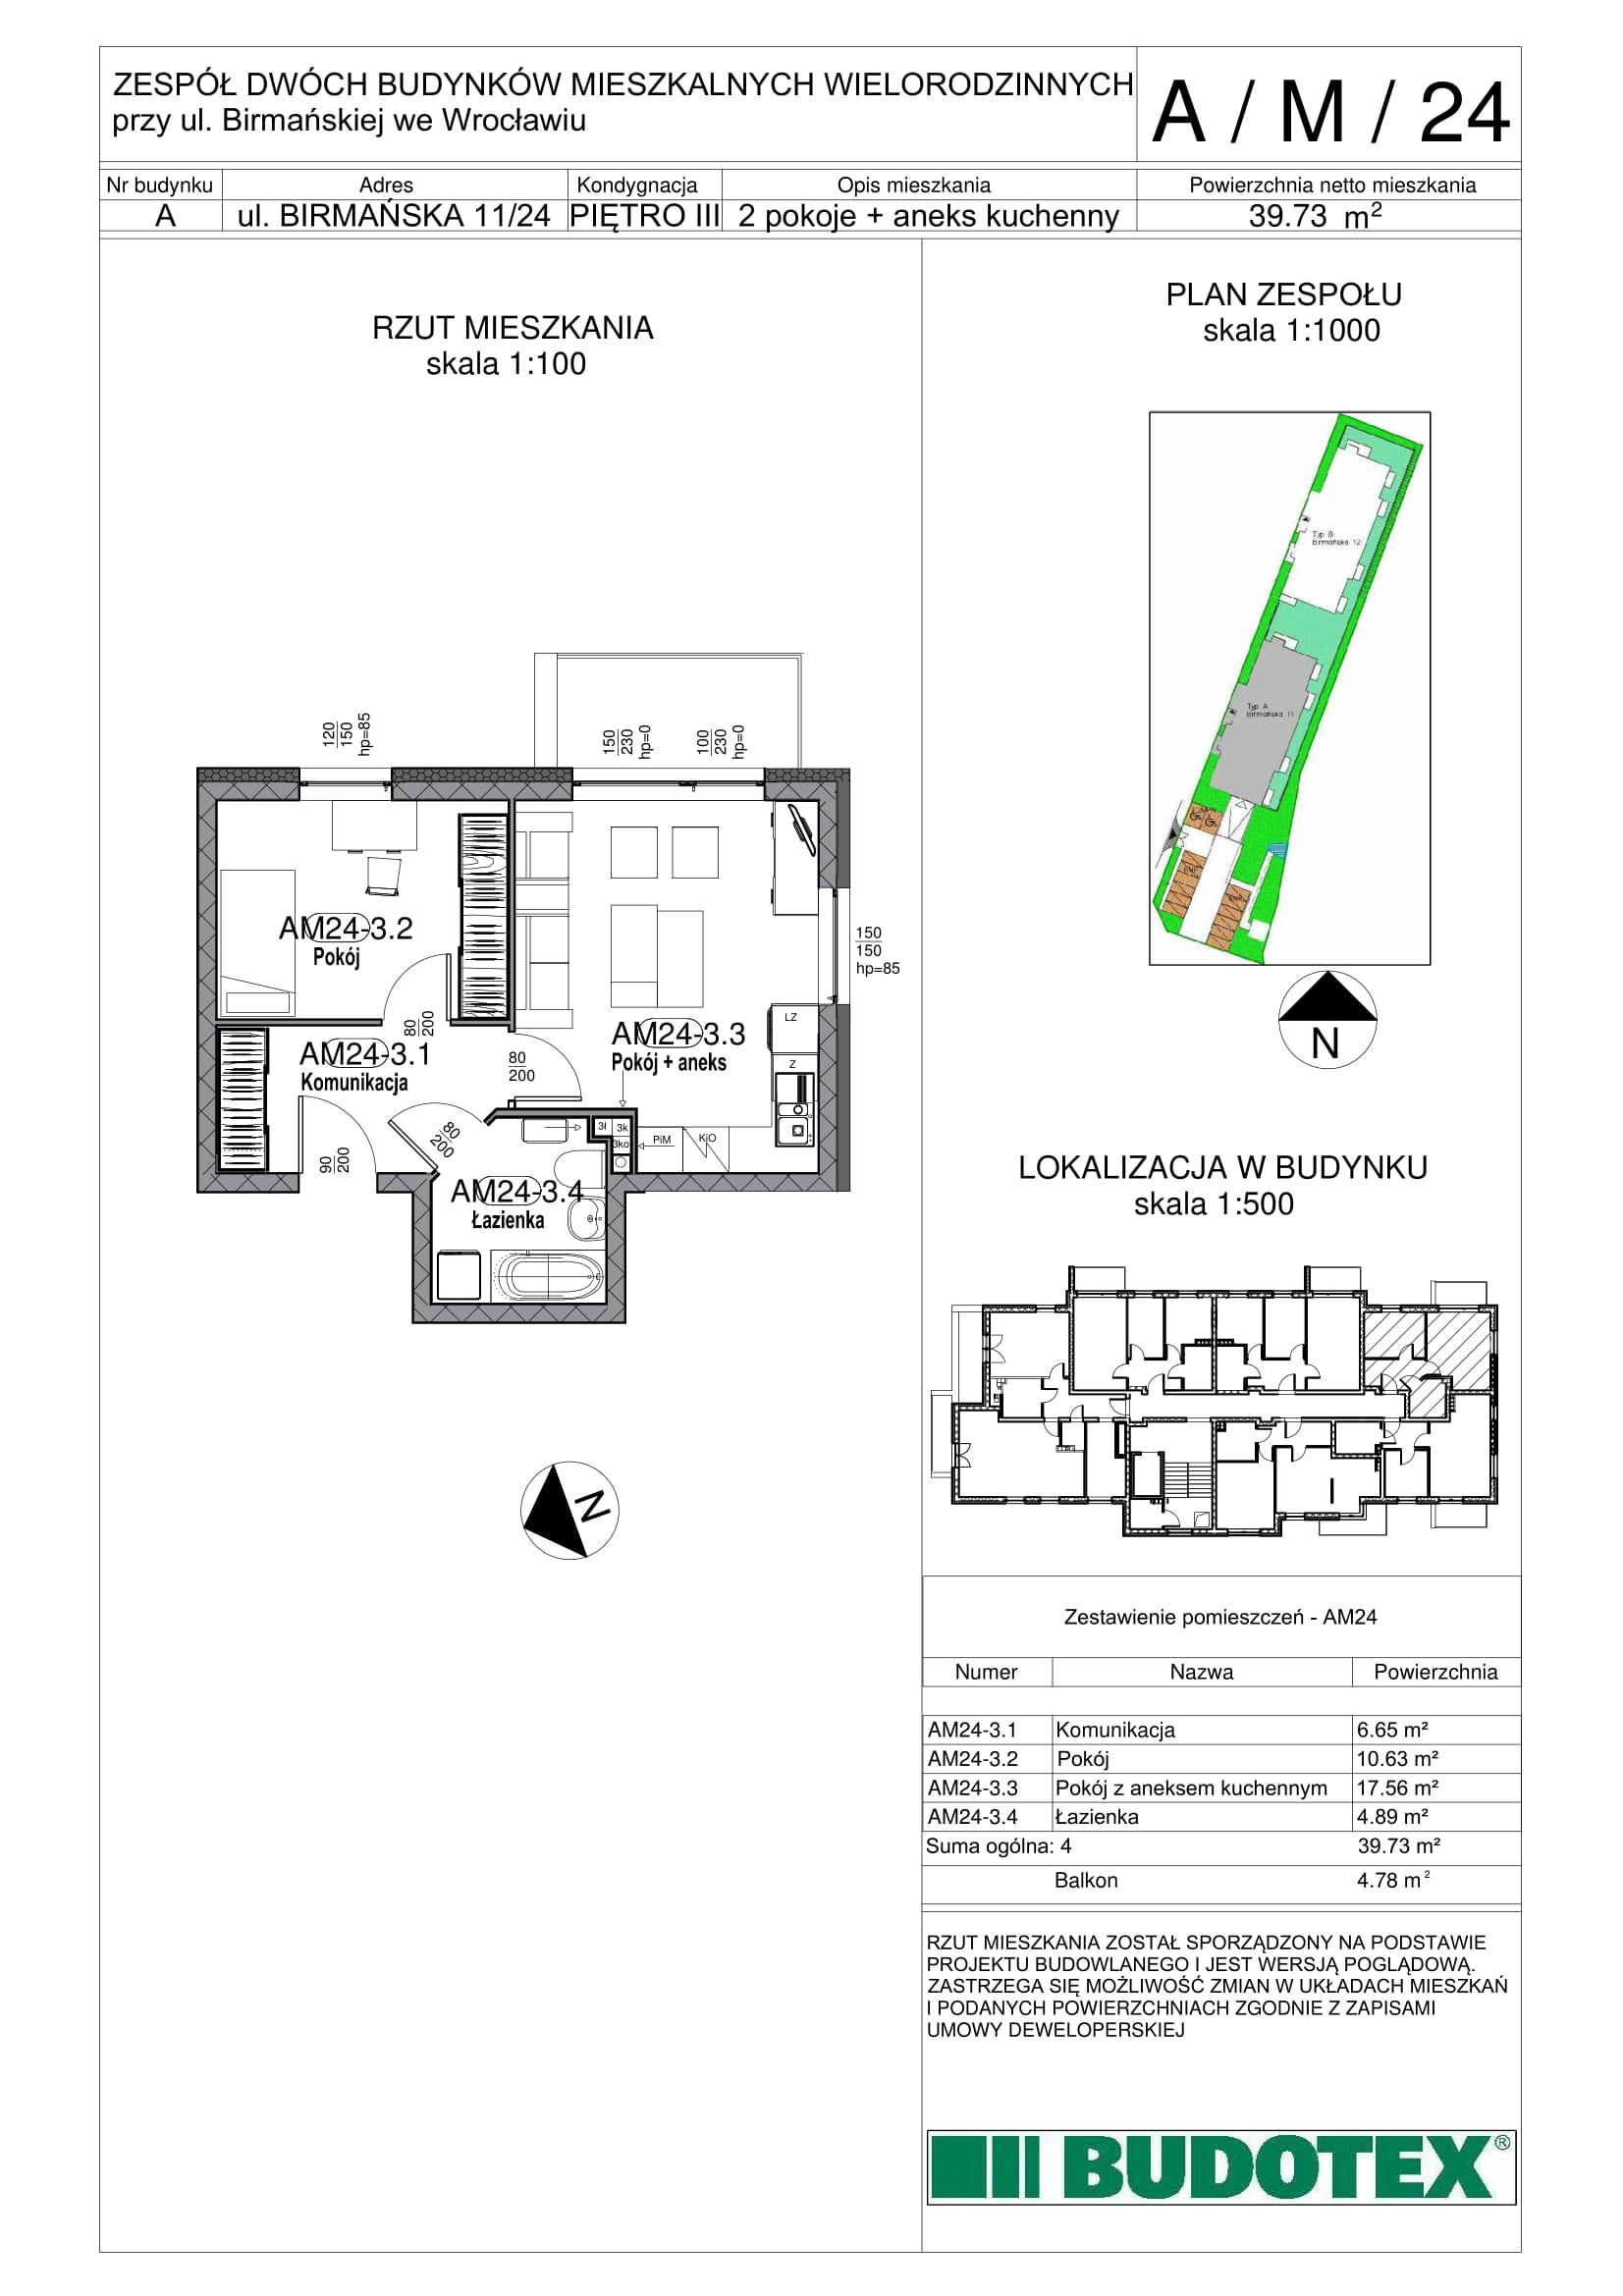 Mieszkanie nr A/M/24